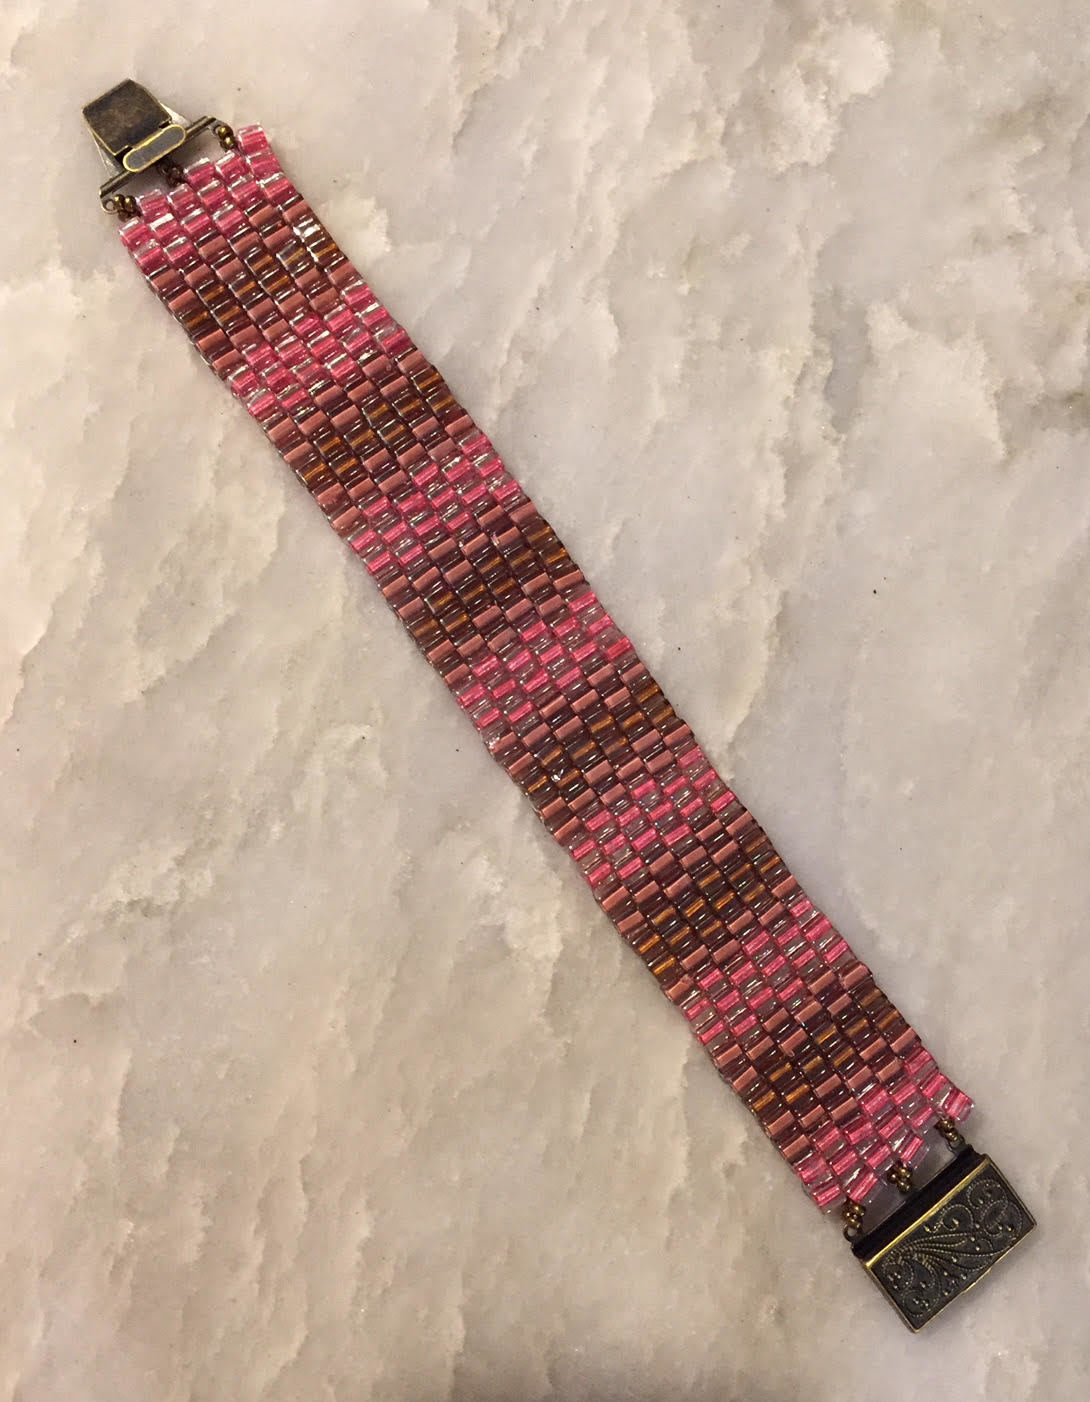 Back to Basics: Peyote Bracelet